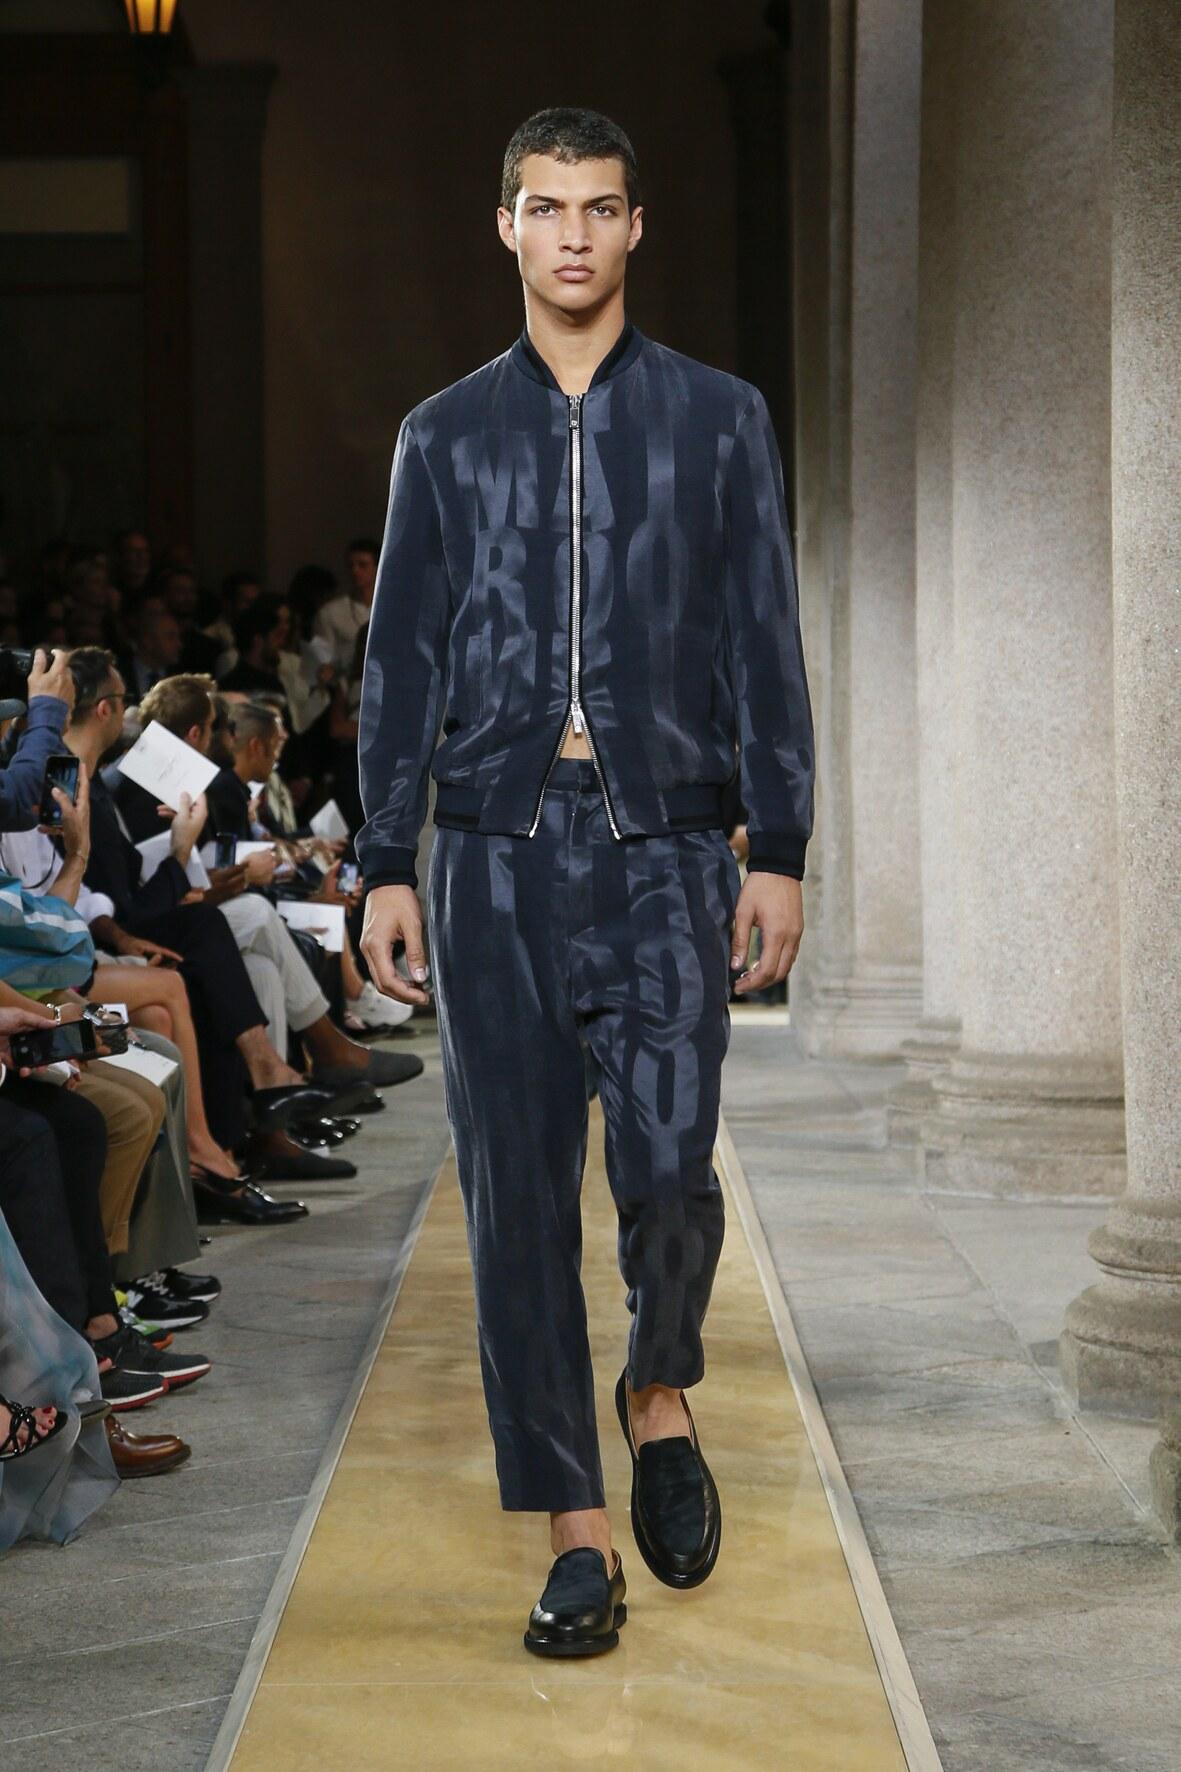 2020 Catwalk Giorgio Armani Fashion Show Summer